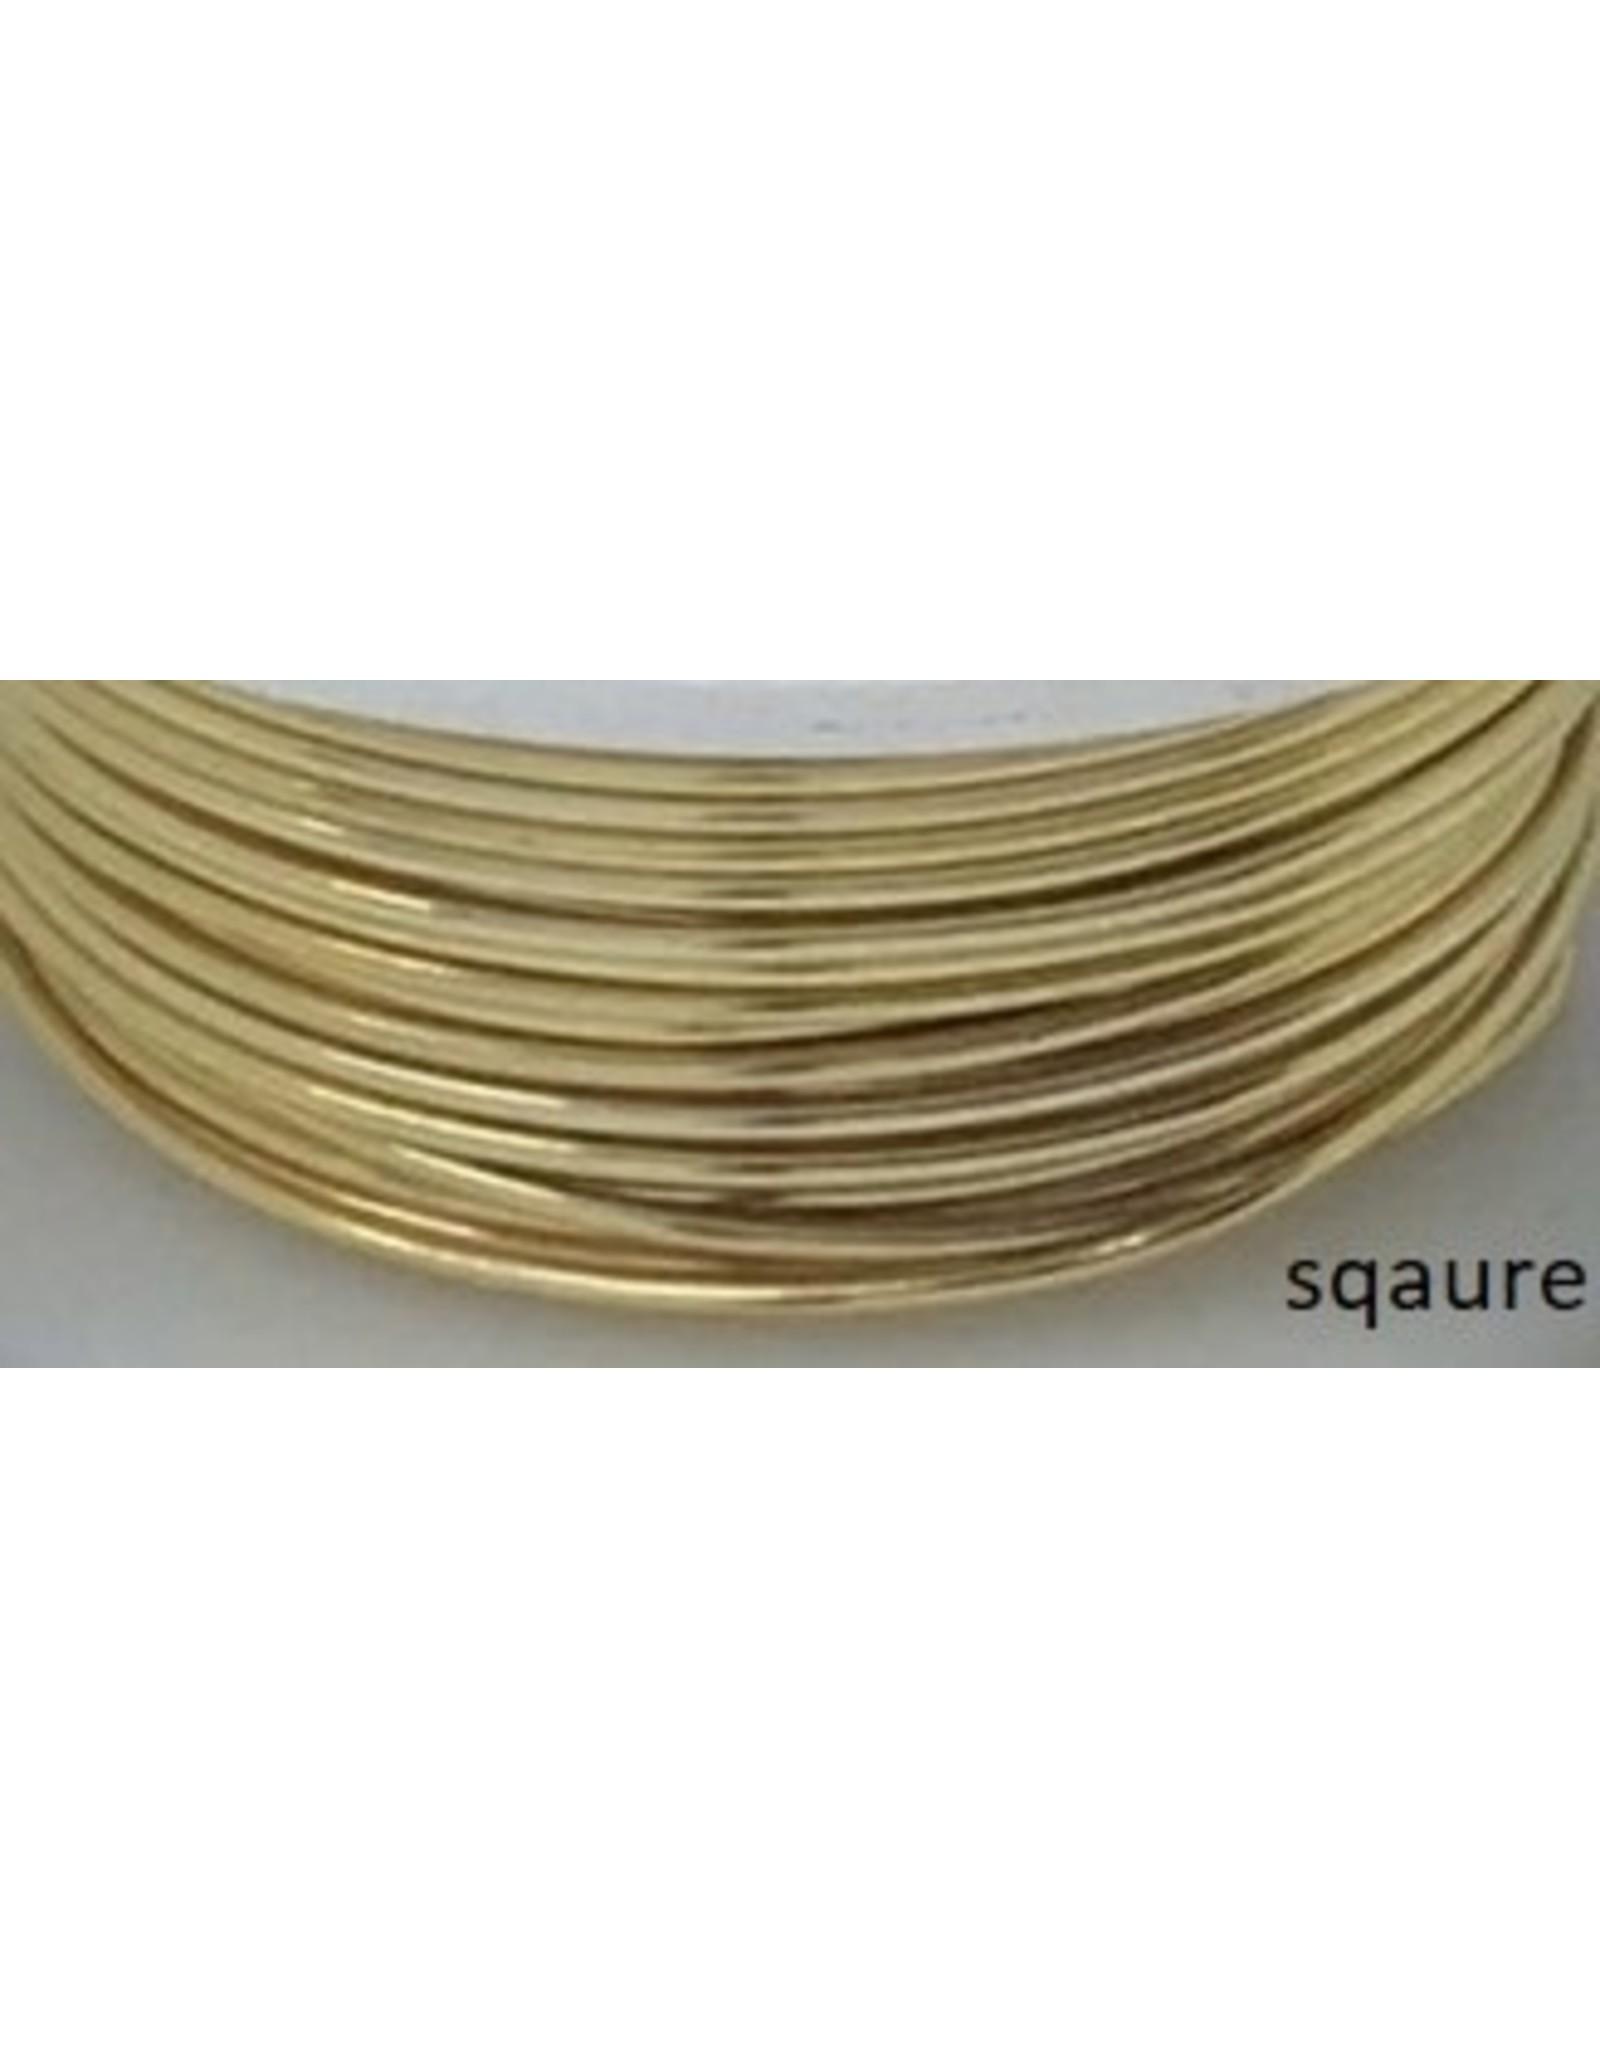 18g  Square Non Tarnish Gold  4y